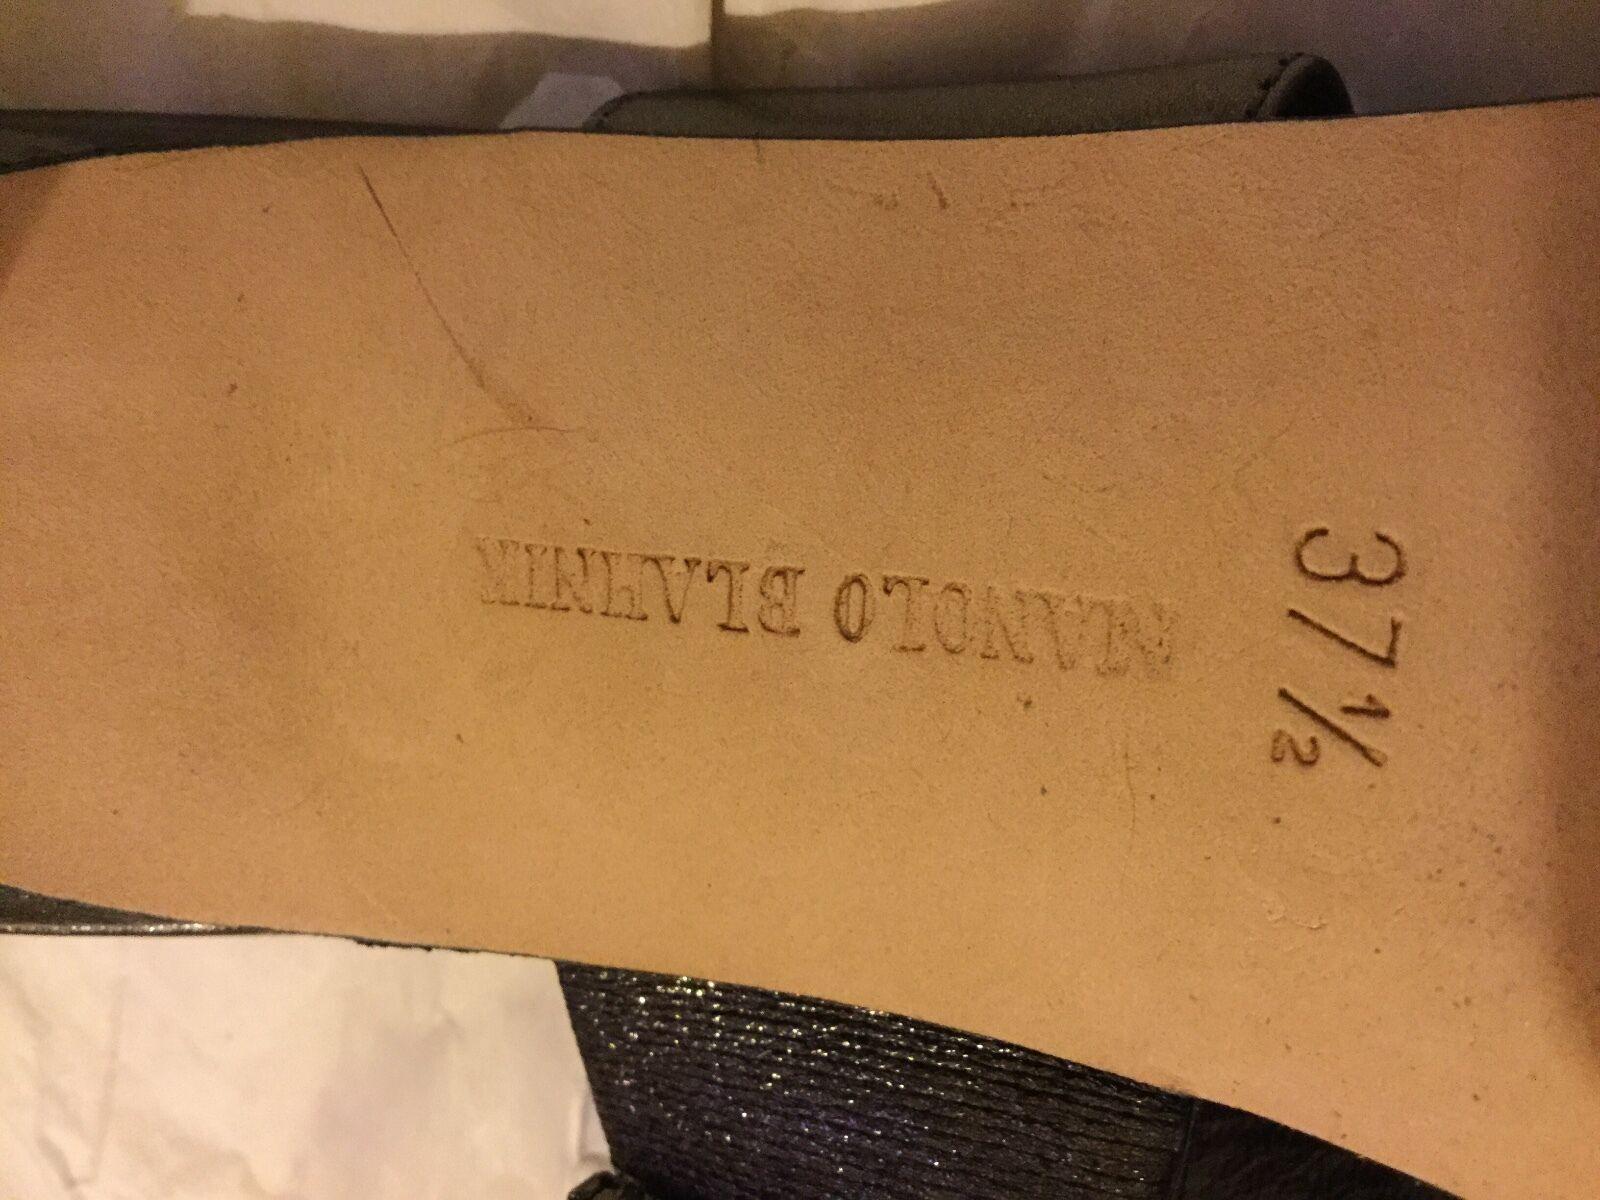 EXCELLENT CONDITION Manolo Blahnik Blahnik Blahnik Jeweled Metallic Leather Sandals - 37.5 967b46